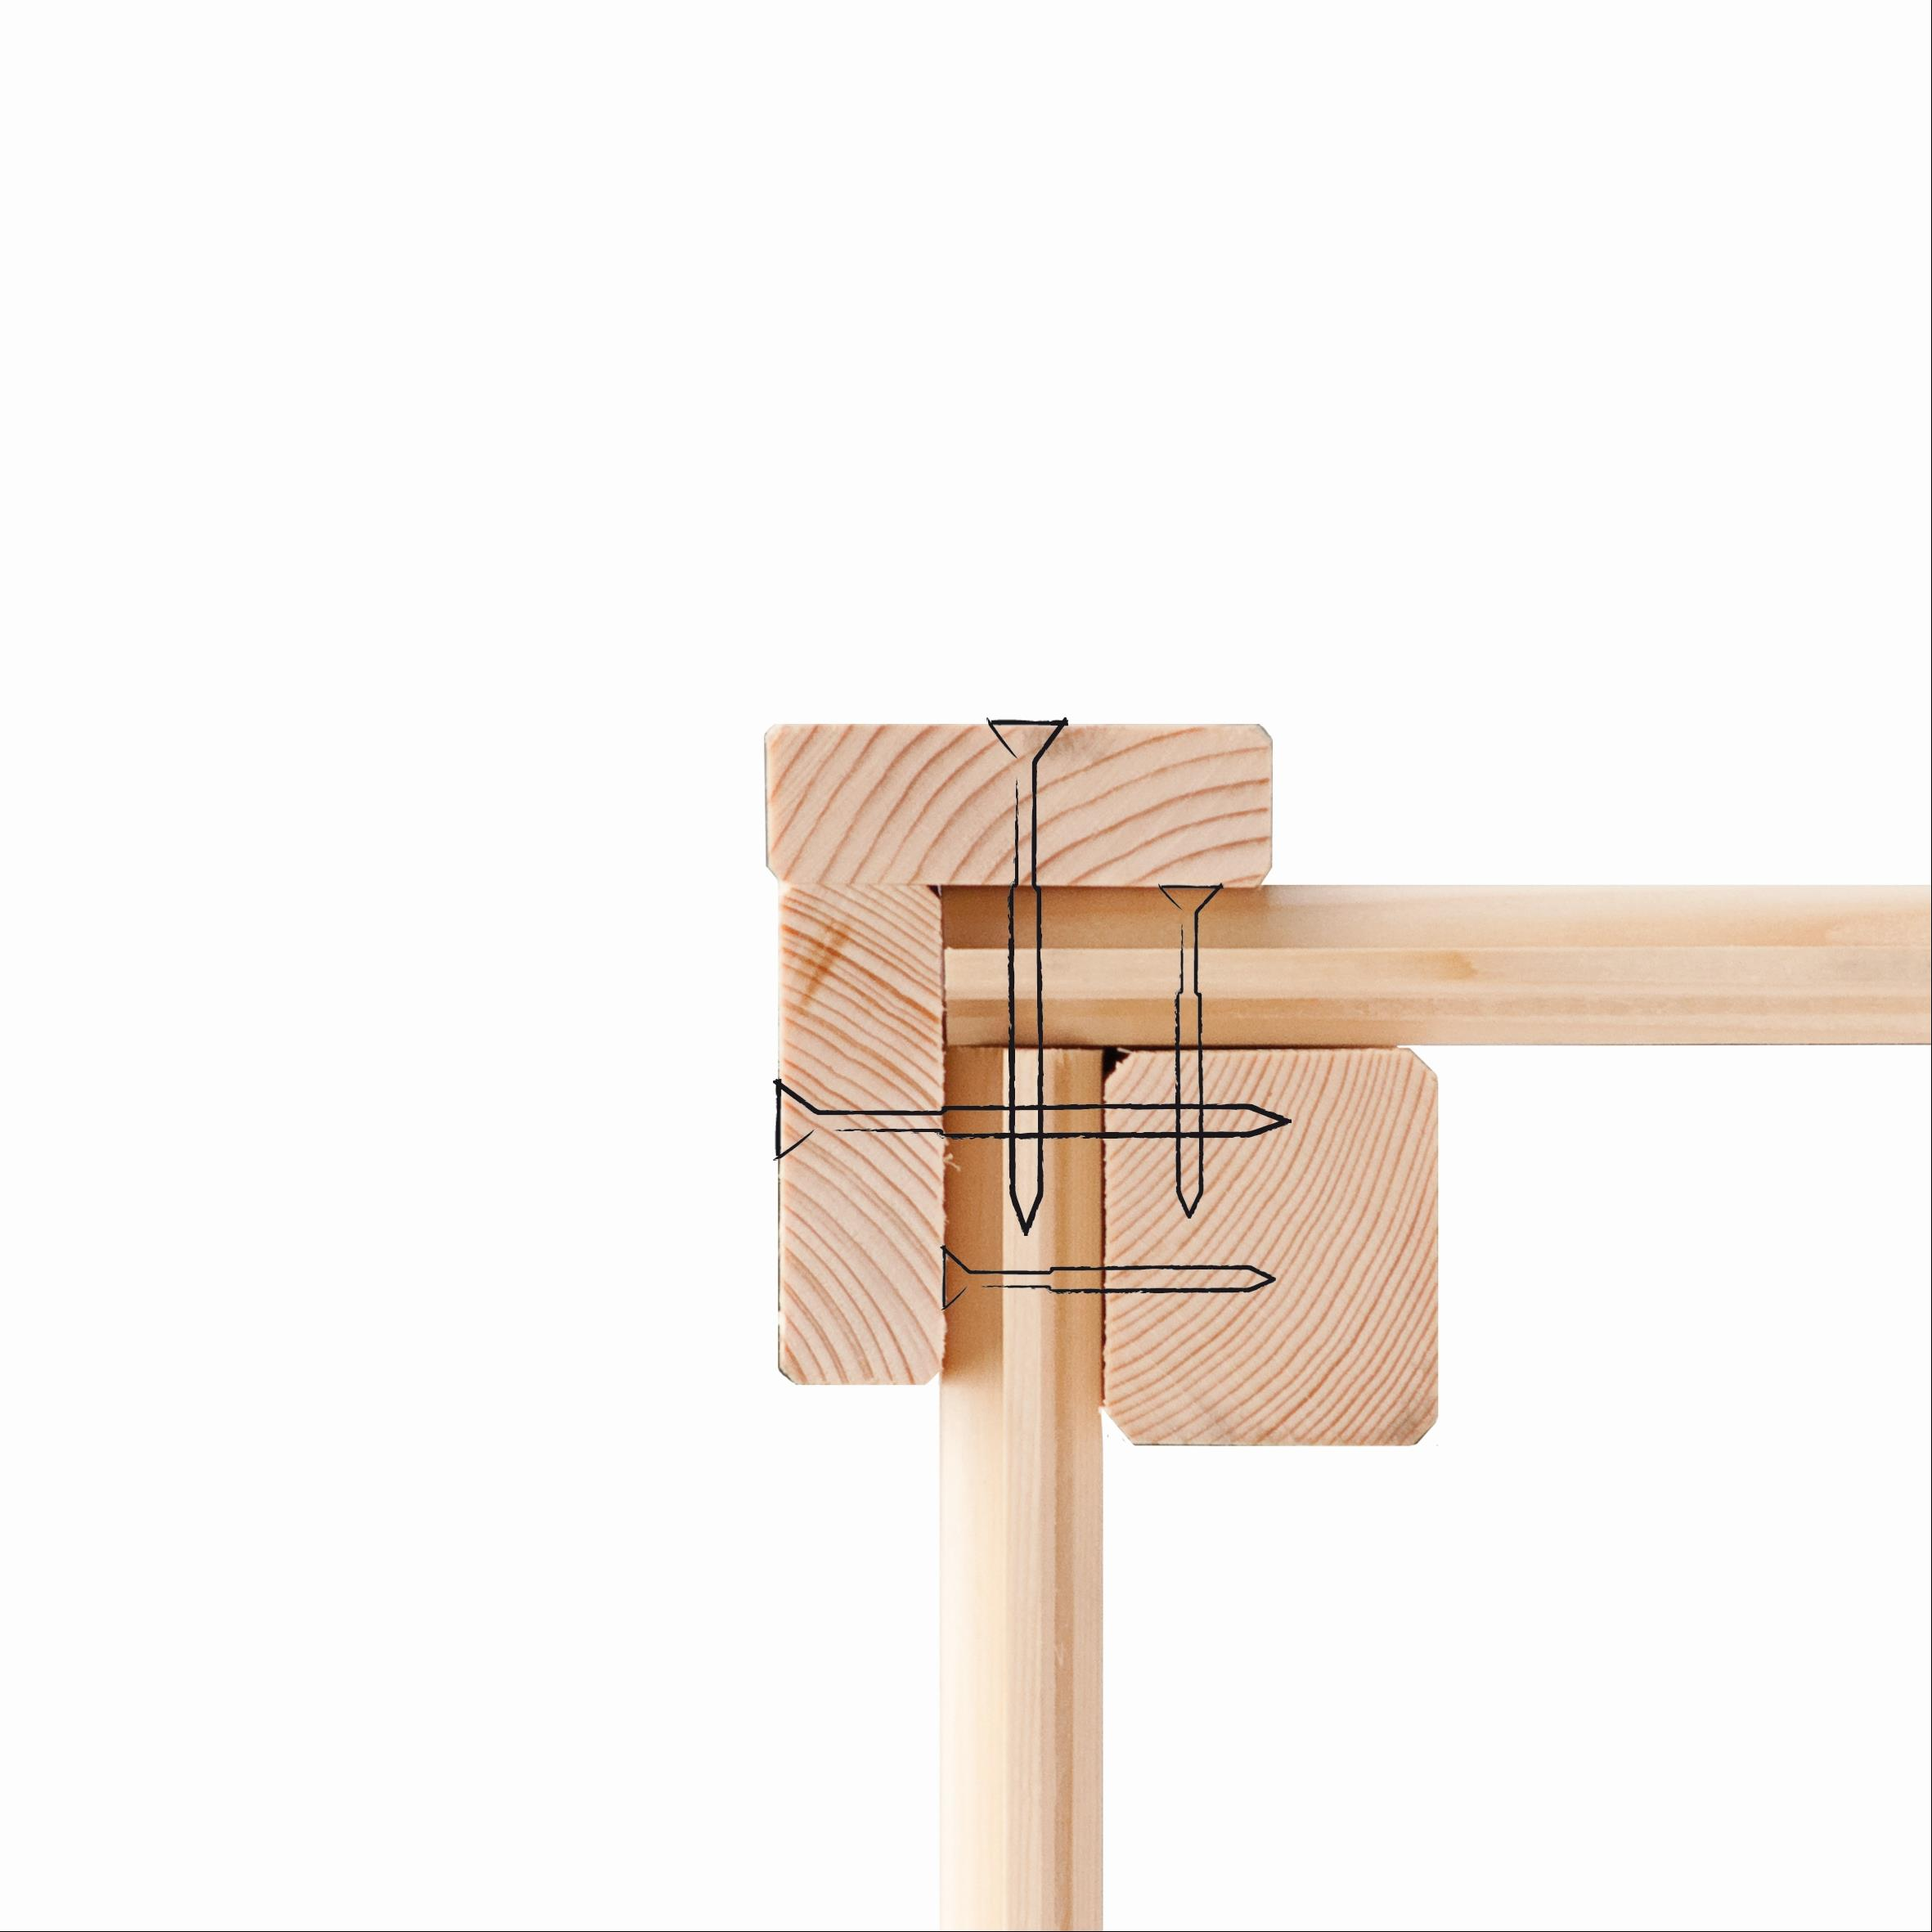 Woodfeeling Mähroboter Haus / Garage 1 sandbeige 73x77x49cm Bild 6